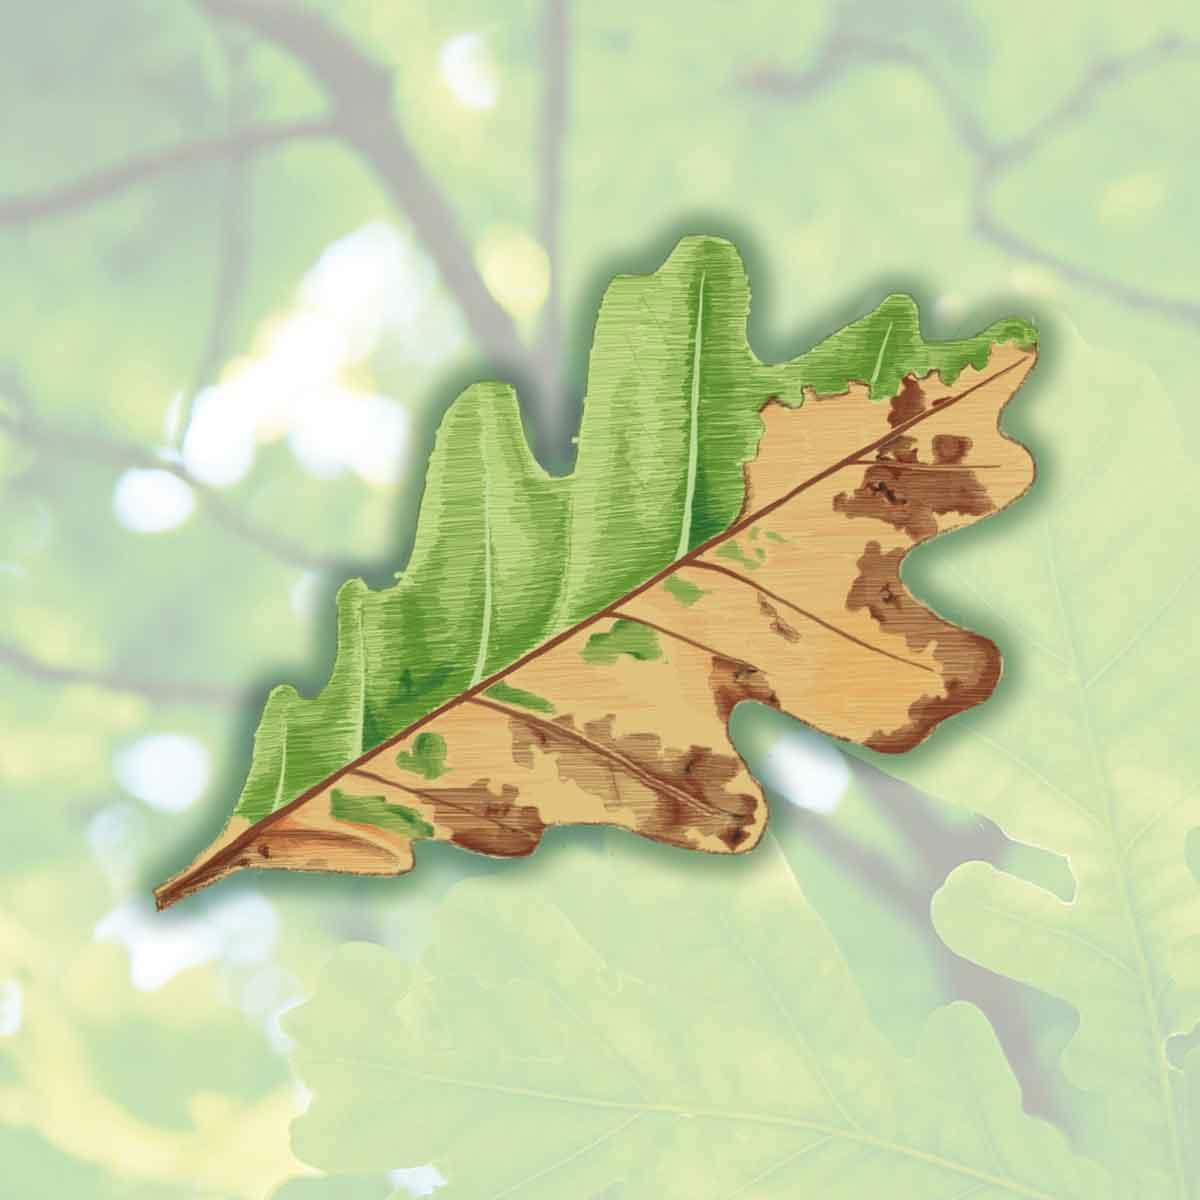 Oak Wilt – Ceratocystis fagacearum